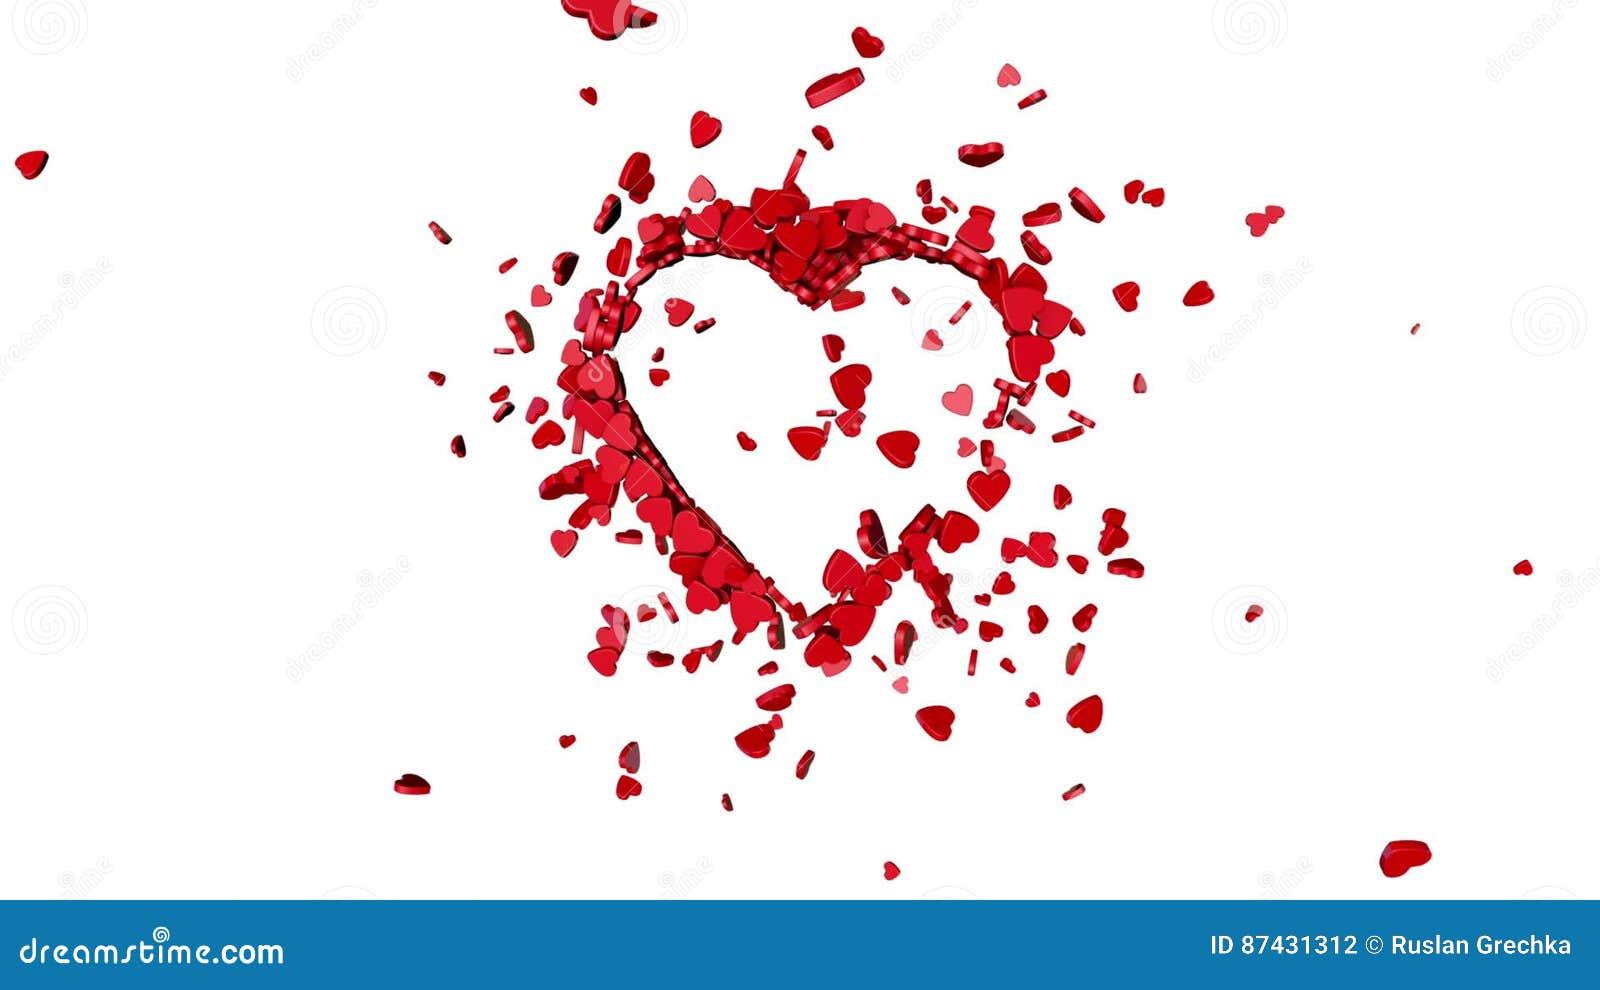 Love Symbol Valentine 3d Animation Stock Footage Video Of